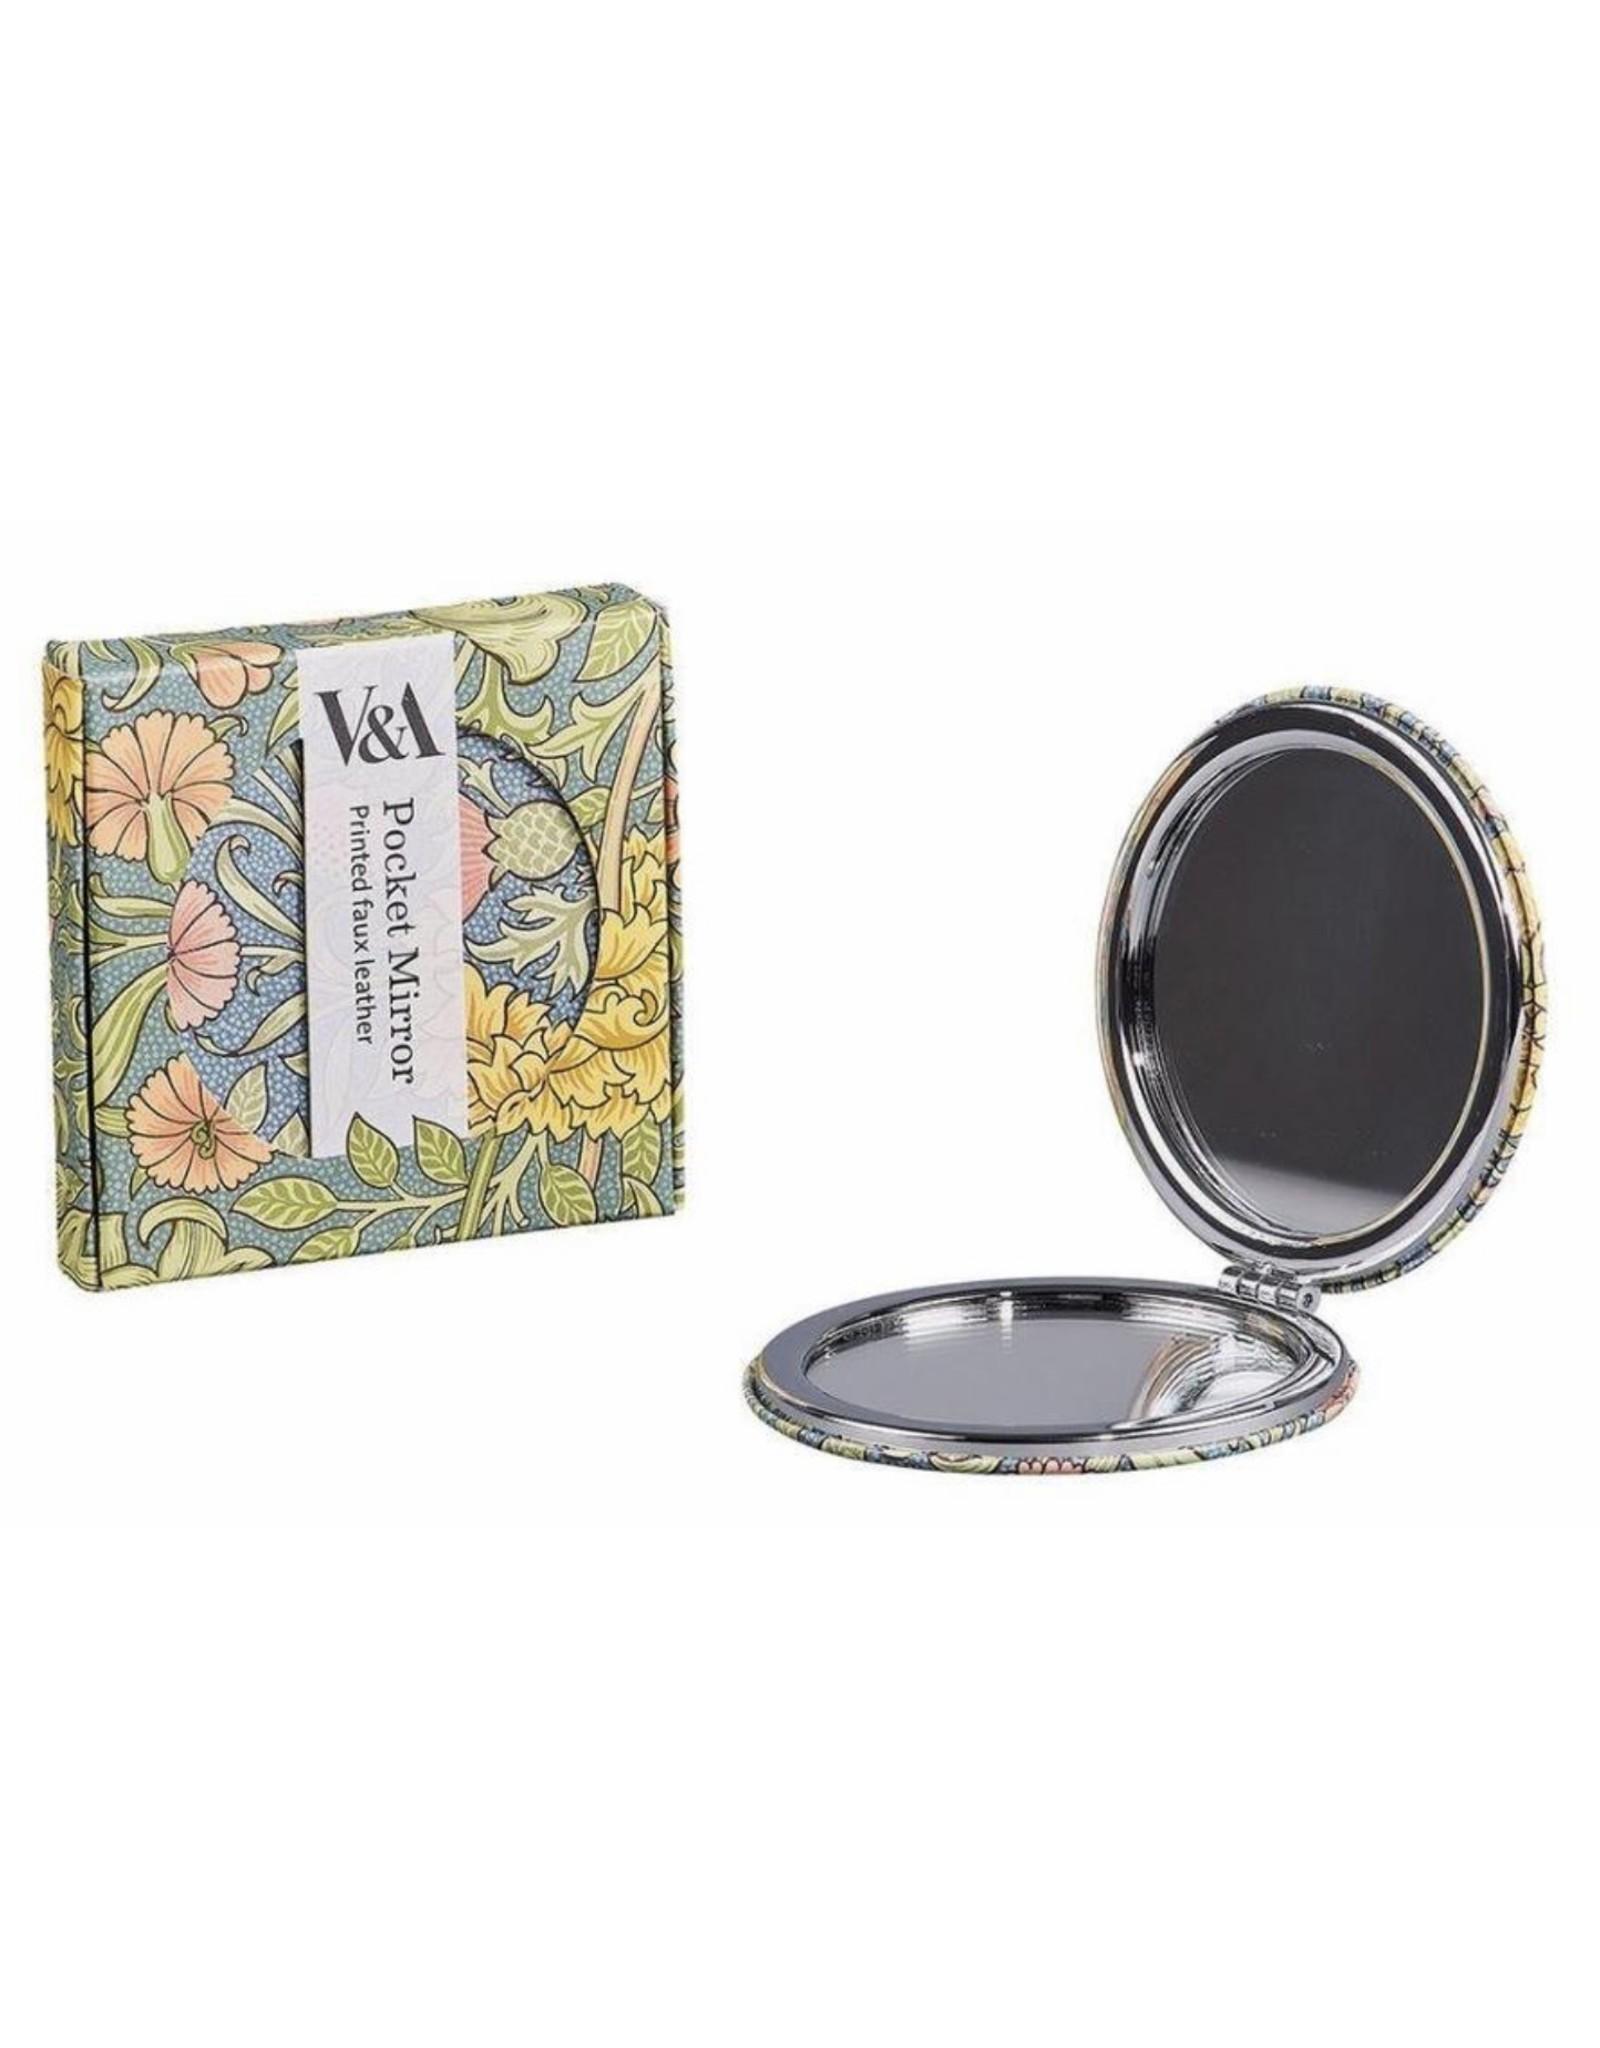 Victoria & Albert Museum V & A Compact Mirror with Designer Vintage Print